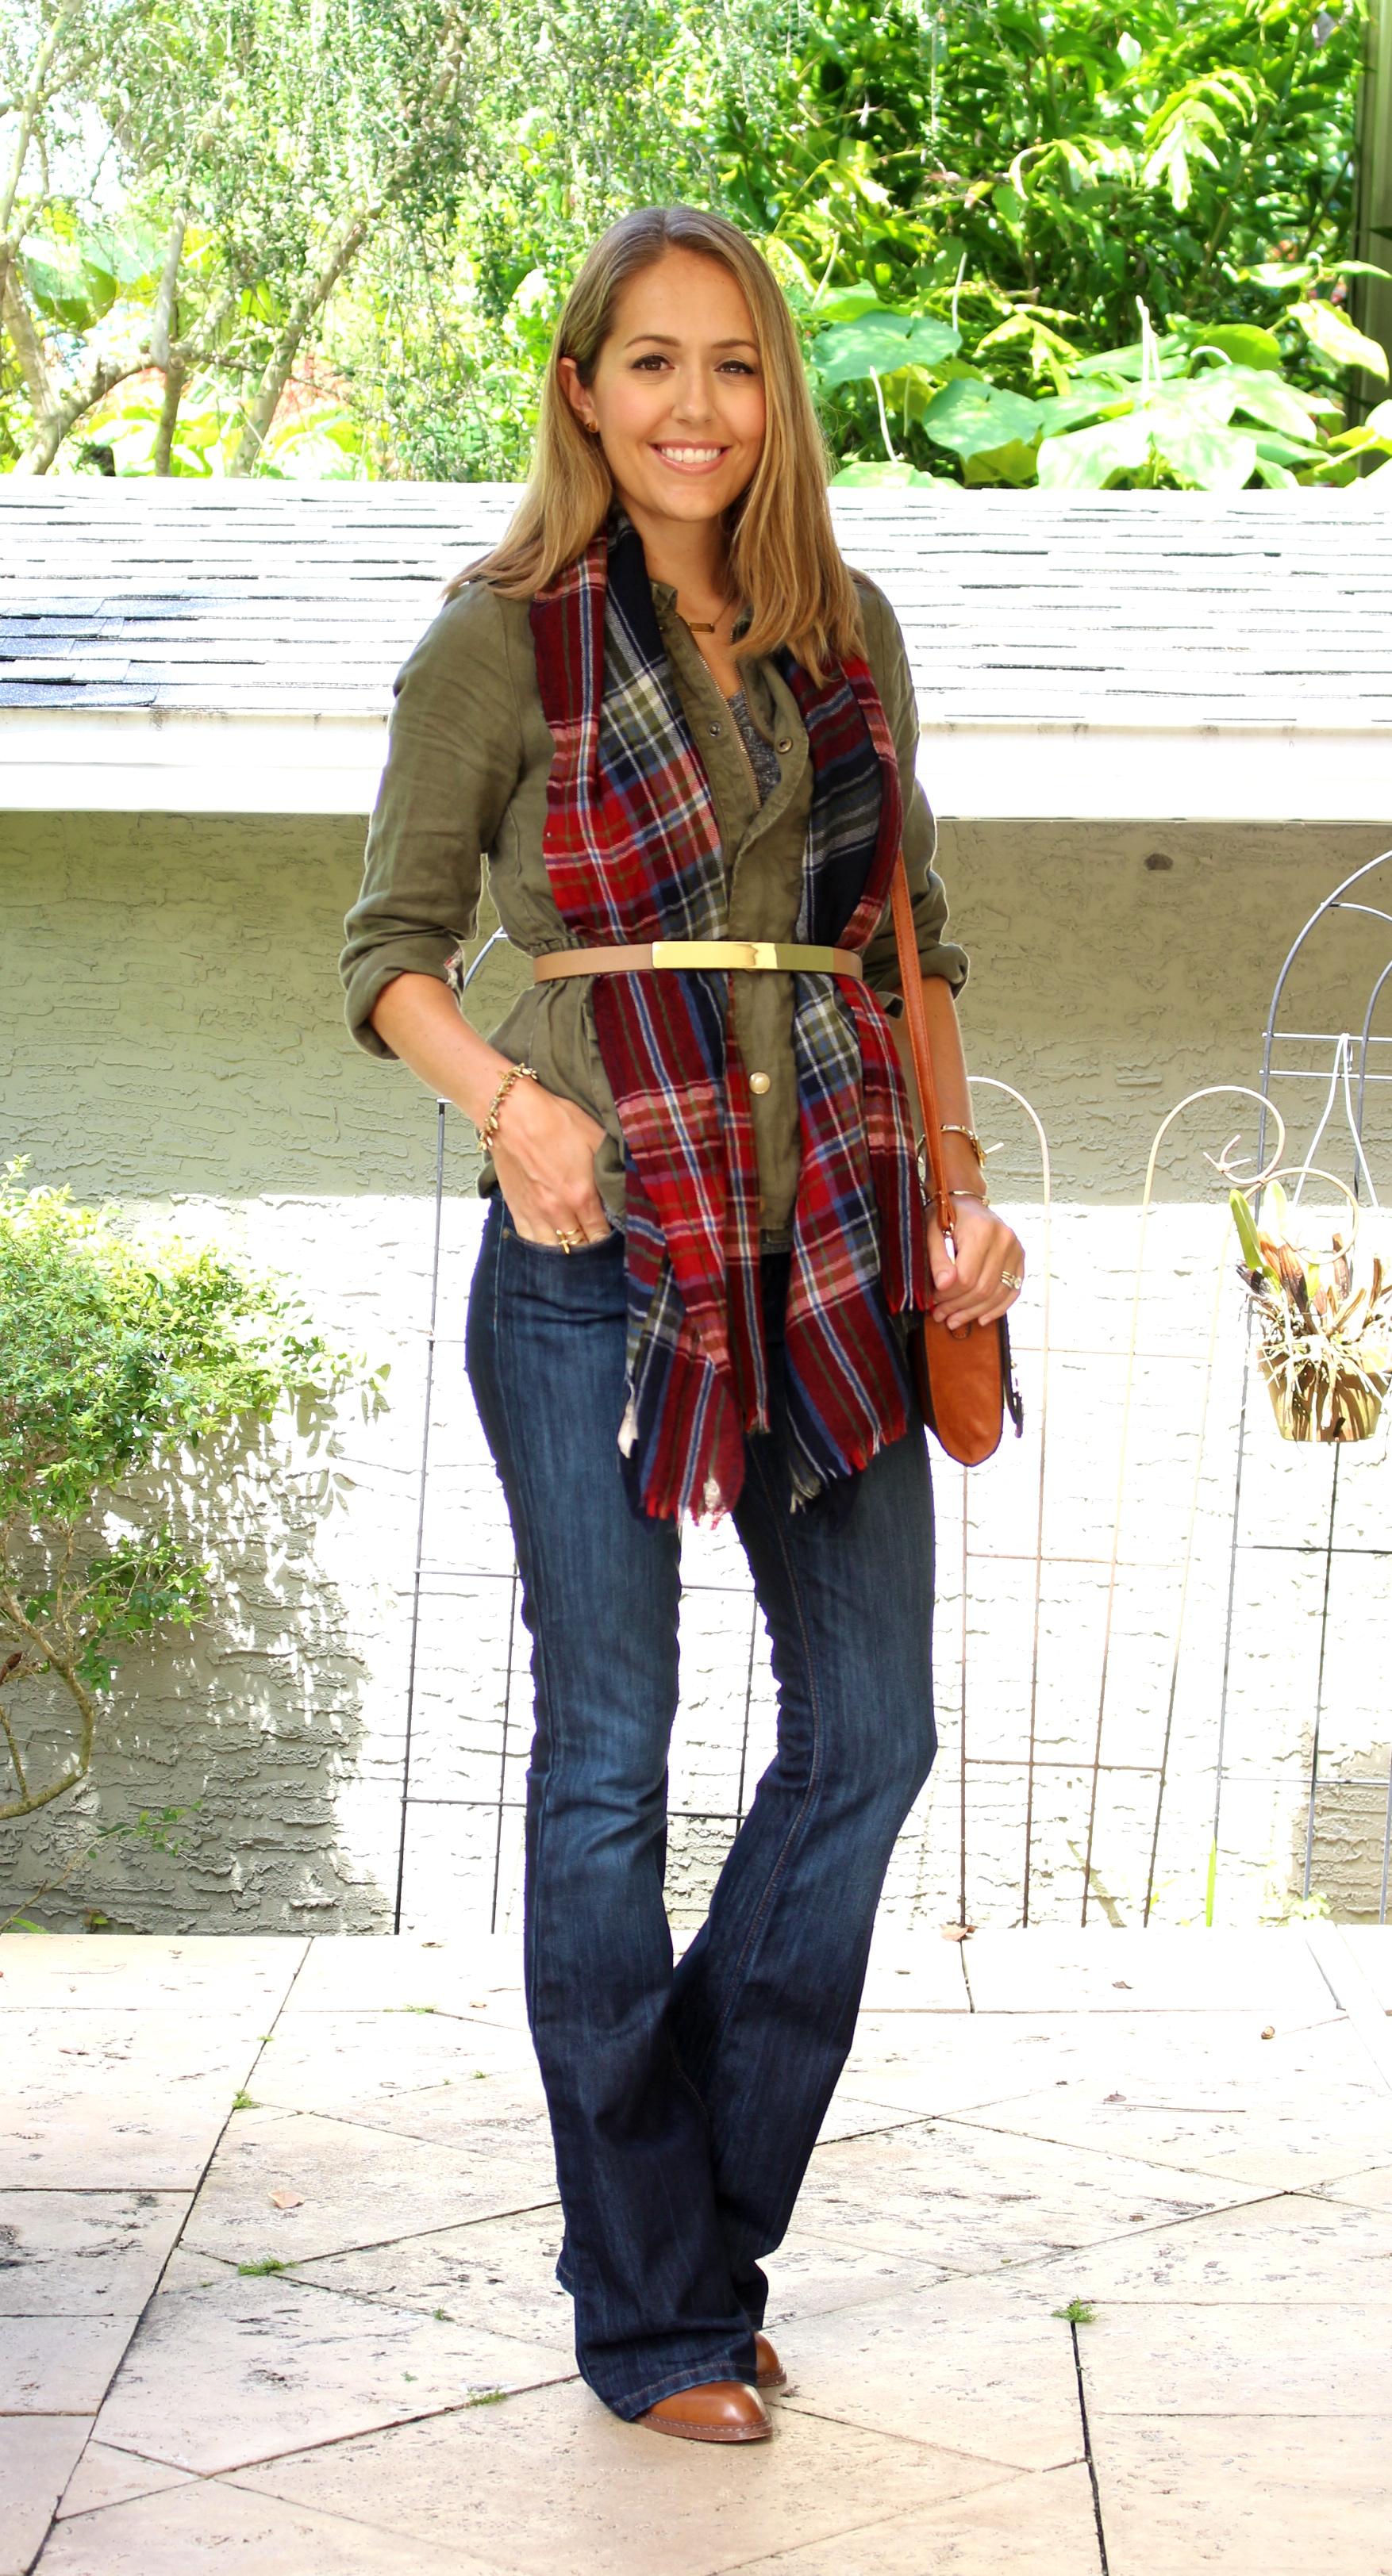 Army jacket, plaid scarf, flare jeans